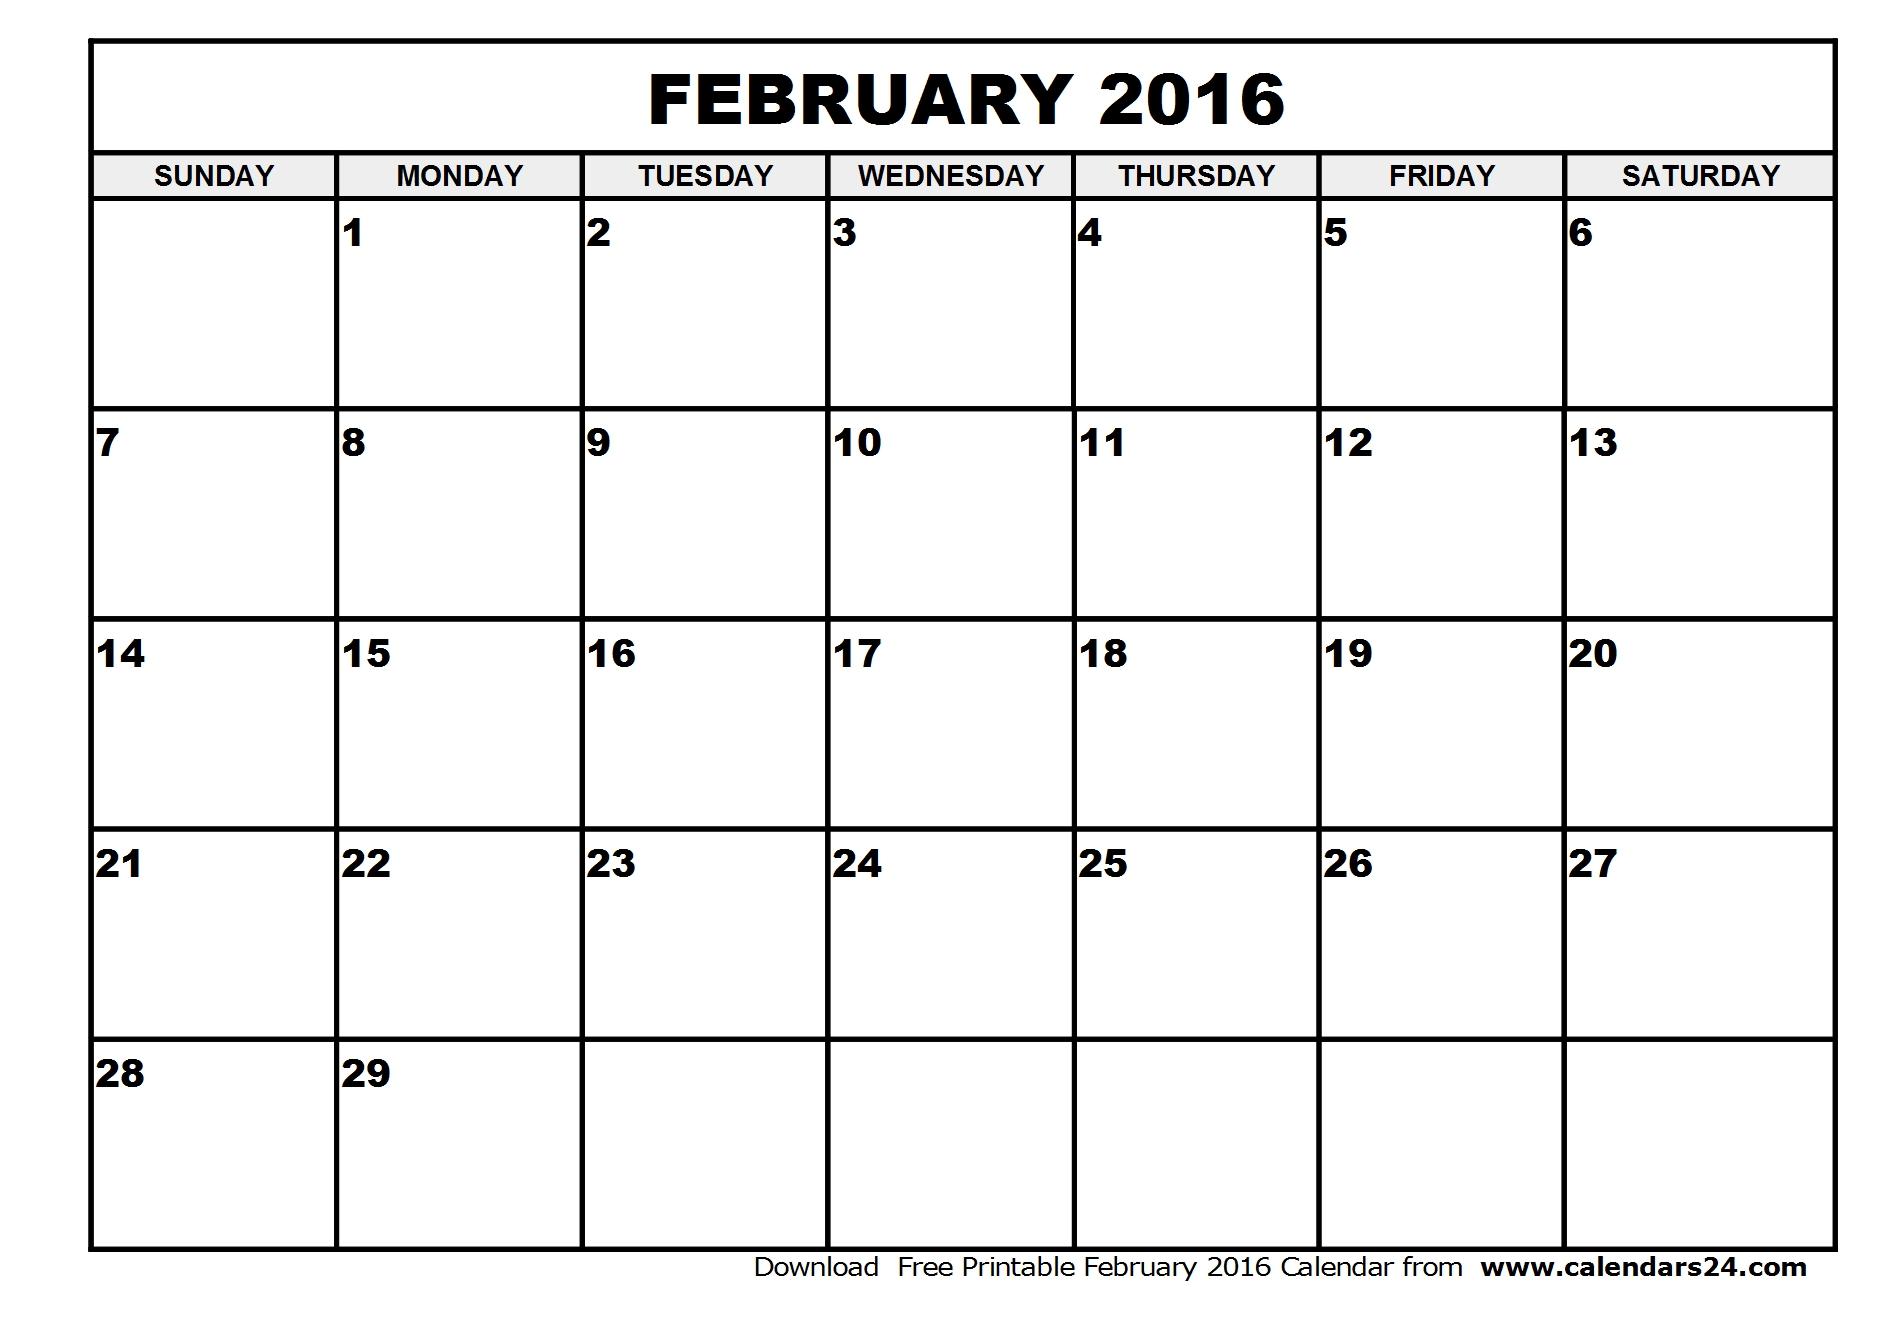 February 2016 Calendar & March 2016 Calendar